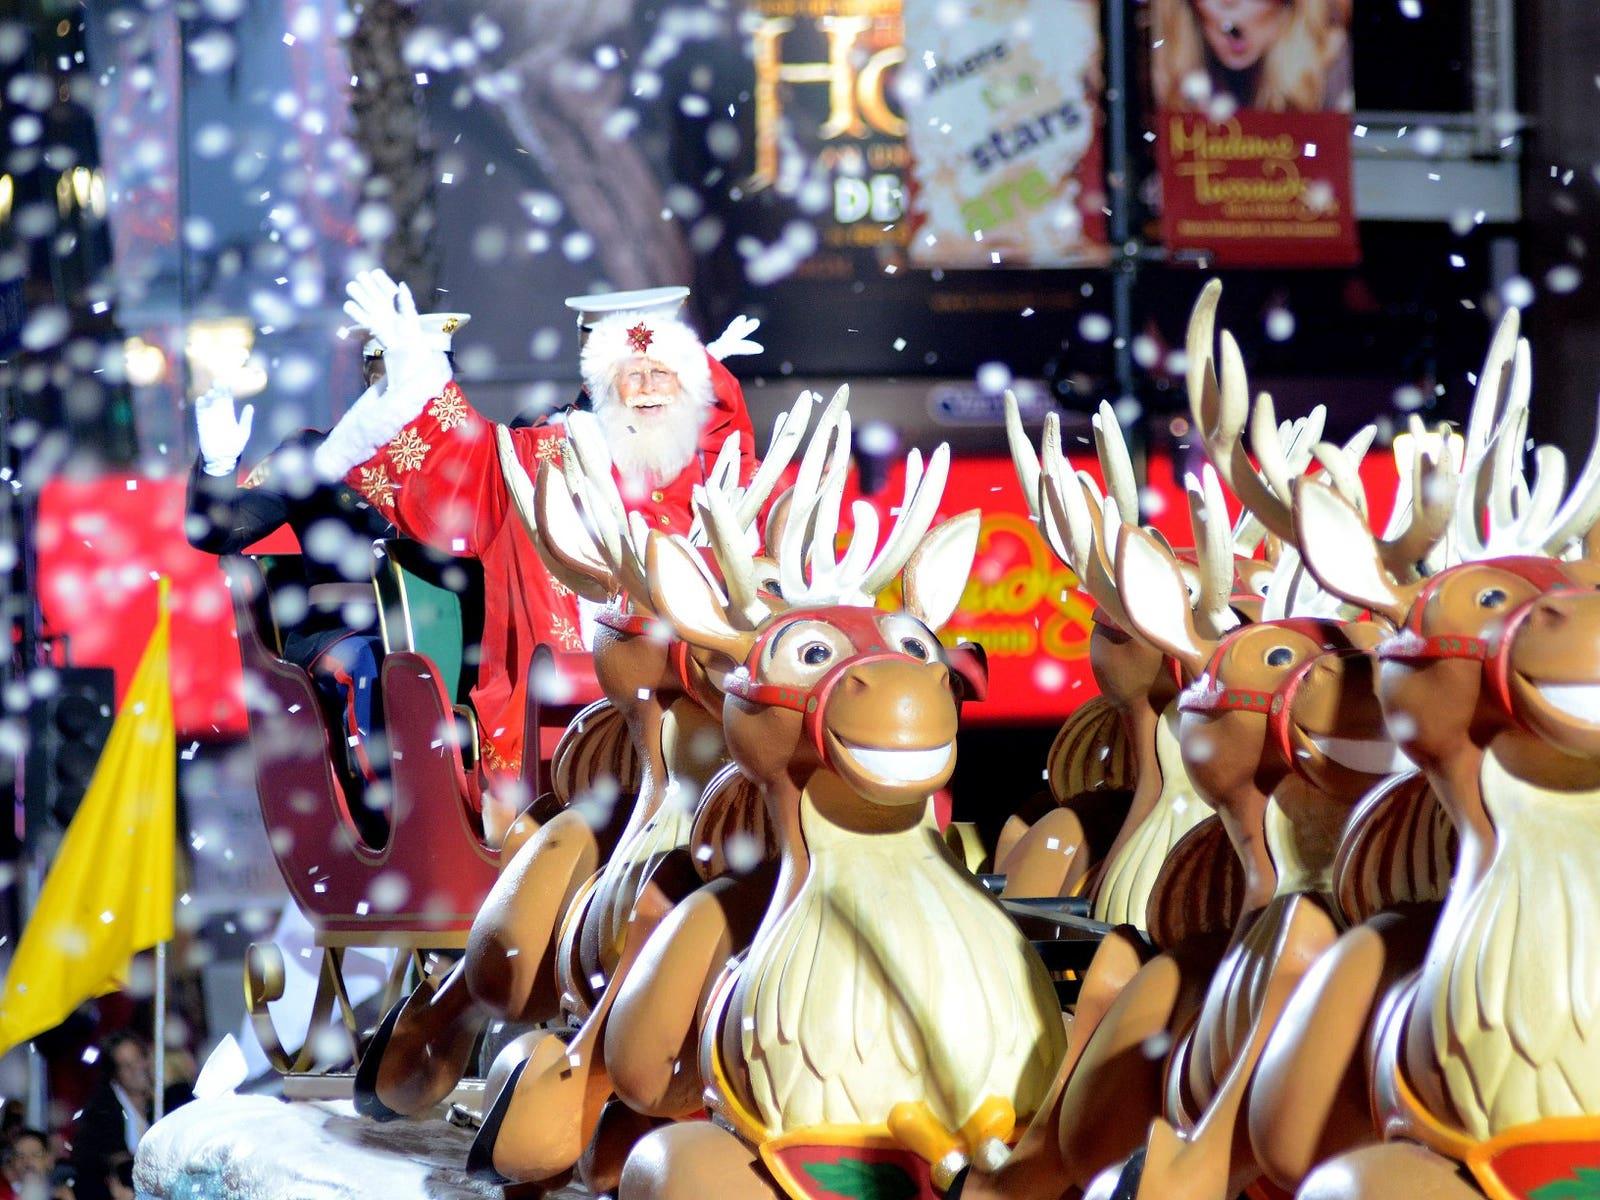 Santa Claus and his reindeer at the Hollywood Christmas Parade